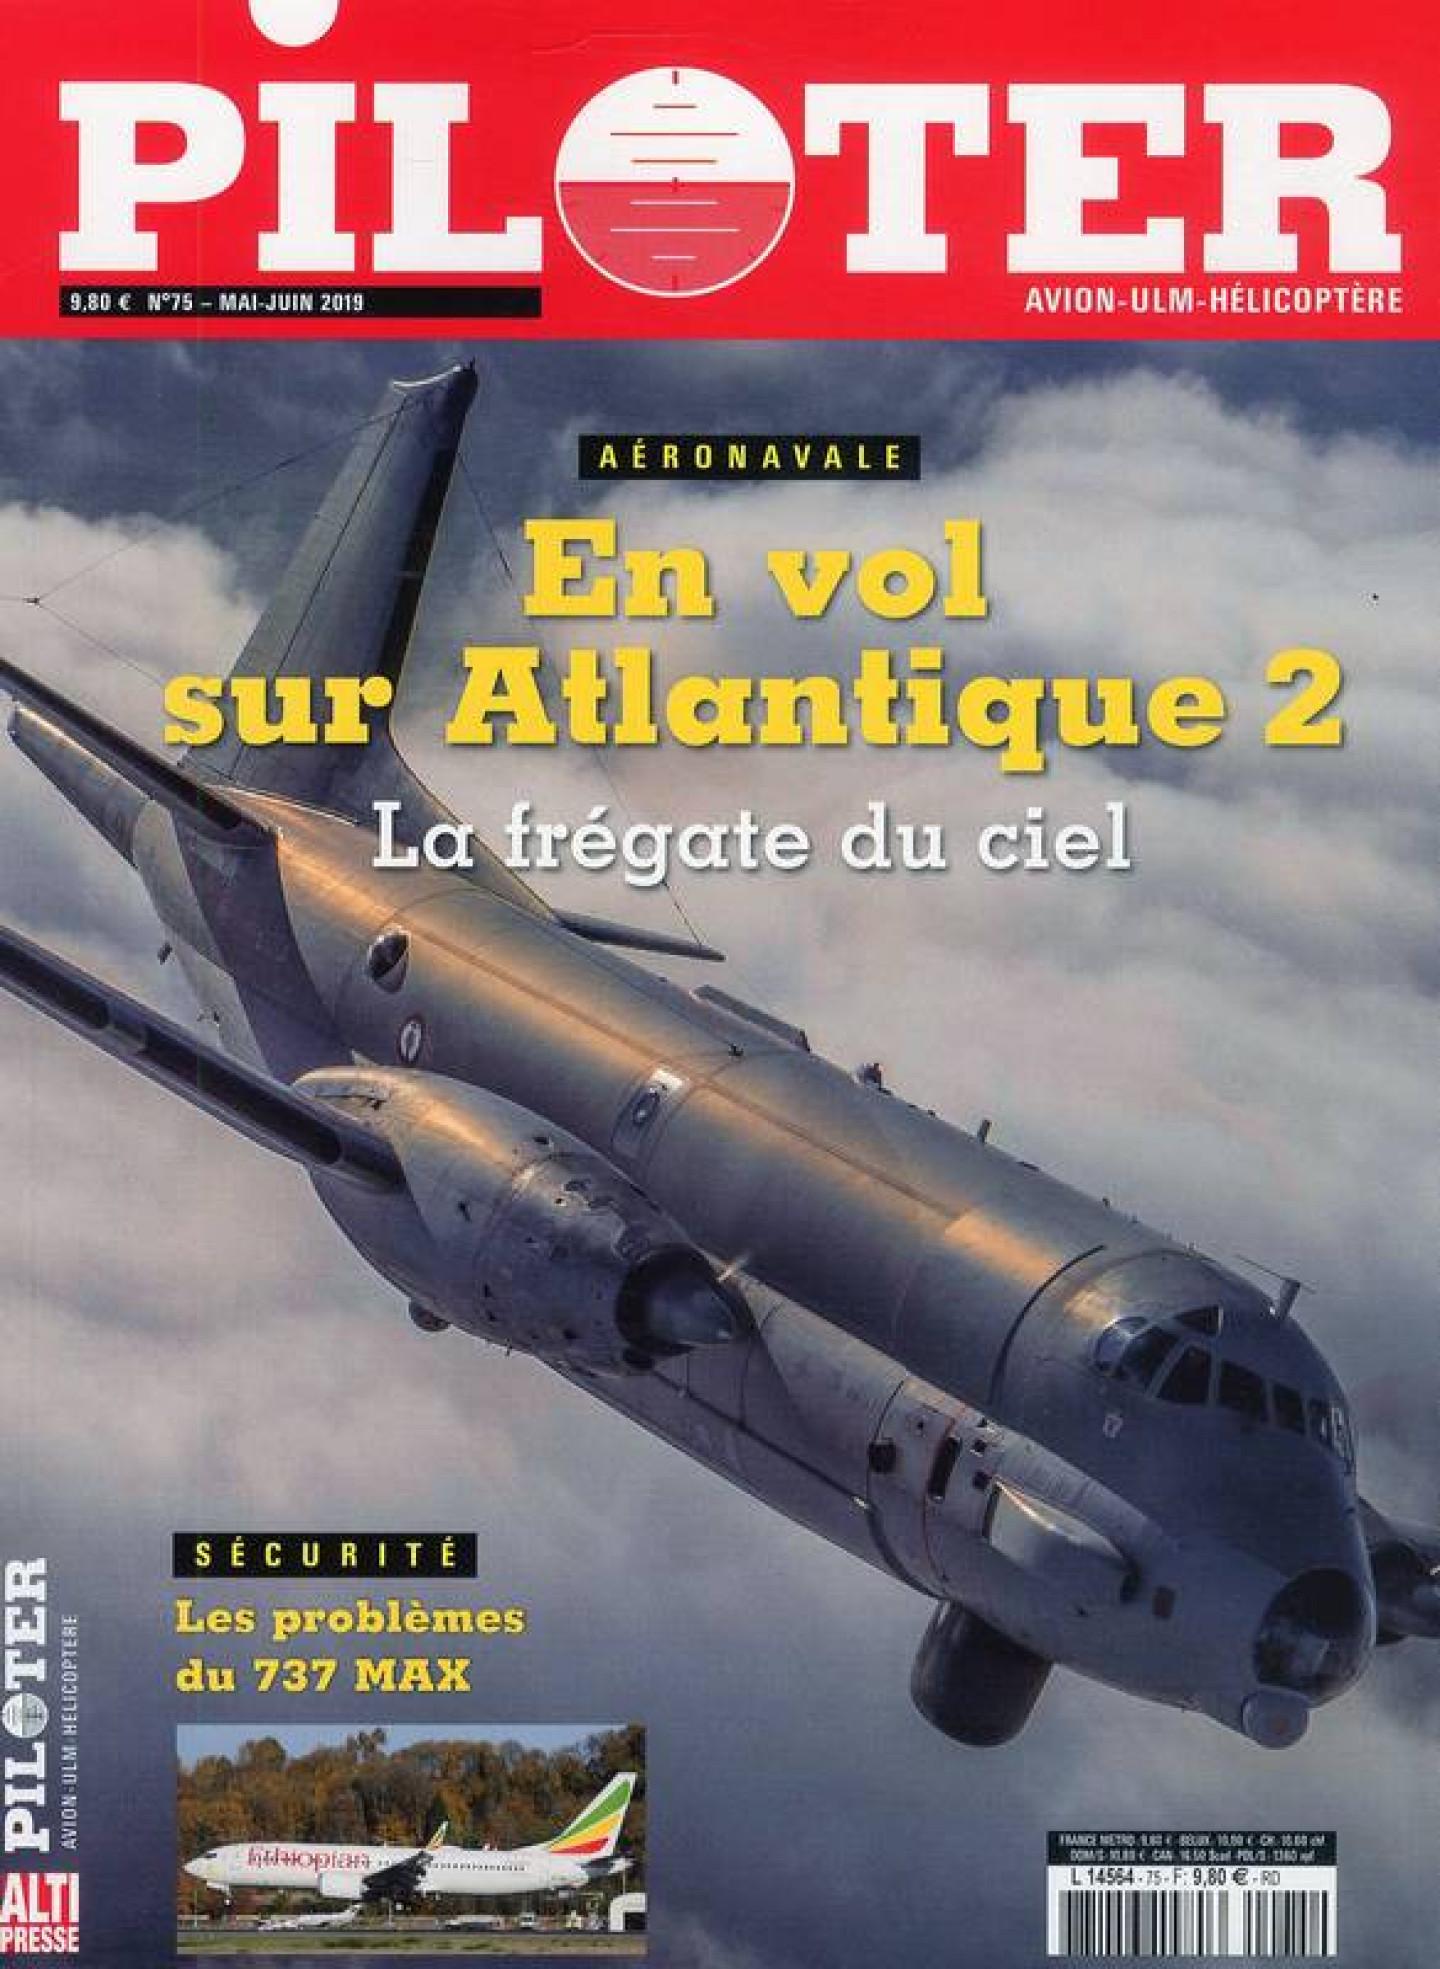 Piloter Mag